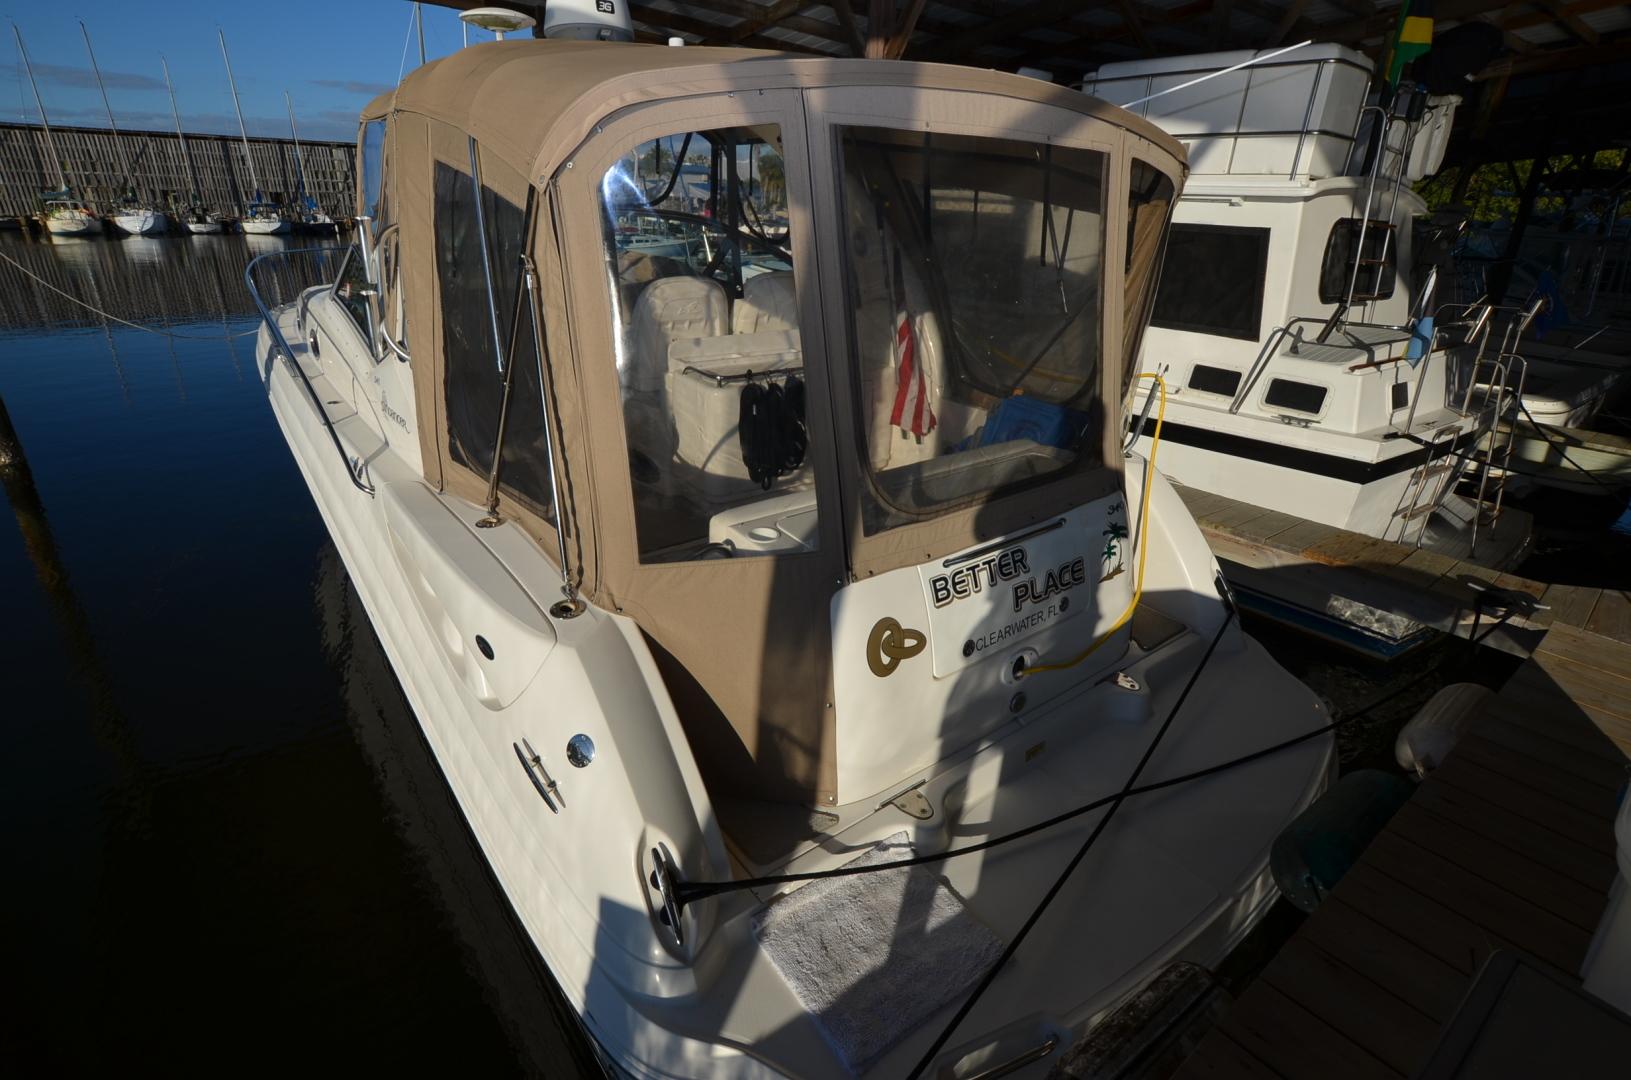 Sea Ray-340 Sundancer 2005-Better Place Palm Harbor-Florida-United States-1562796 | Thumbnail